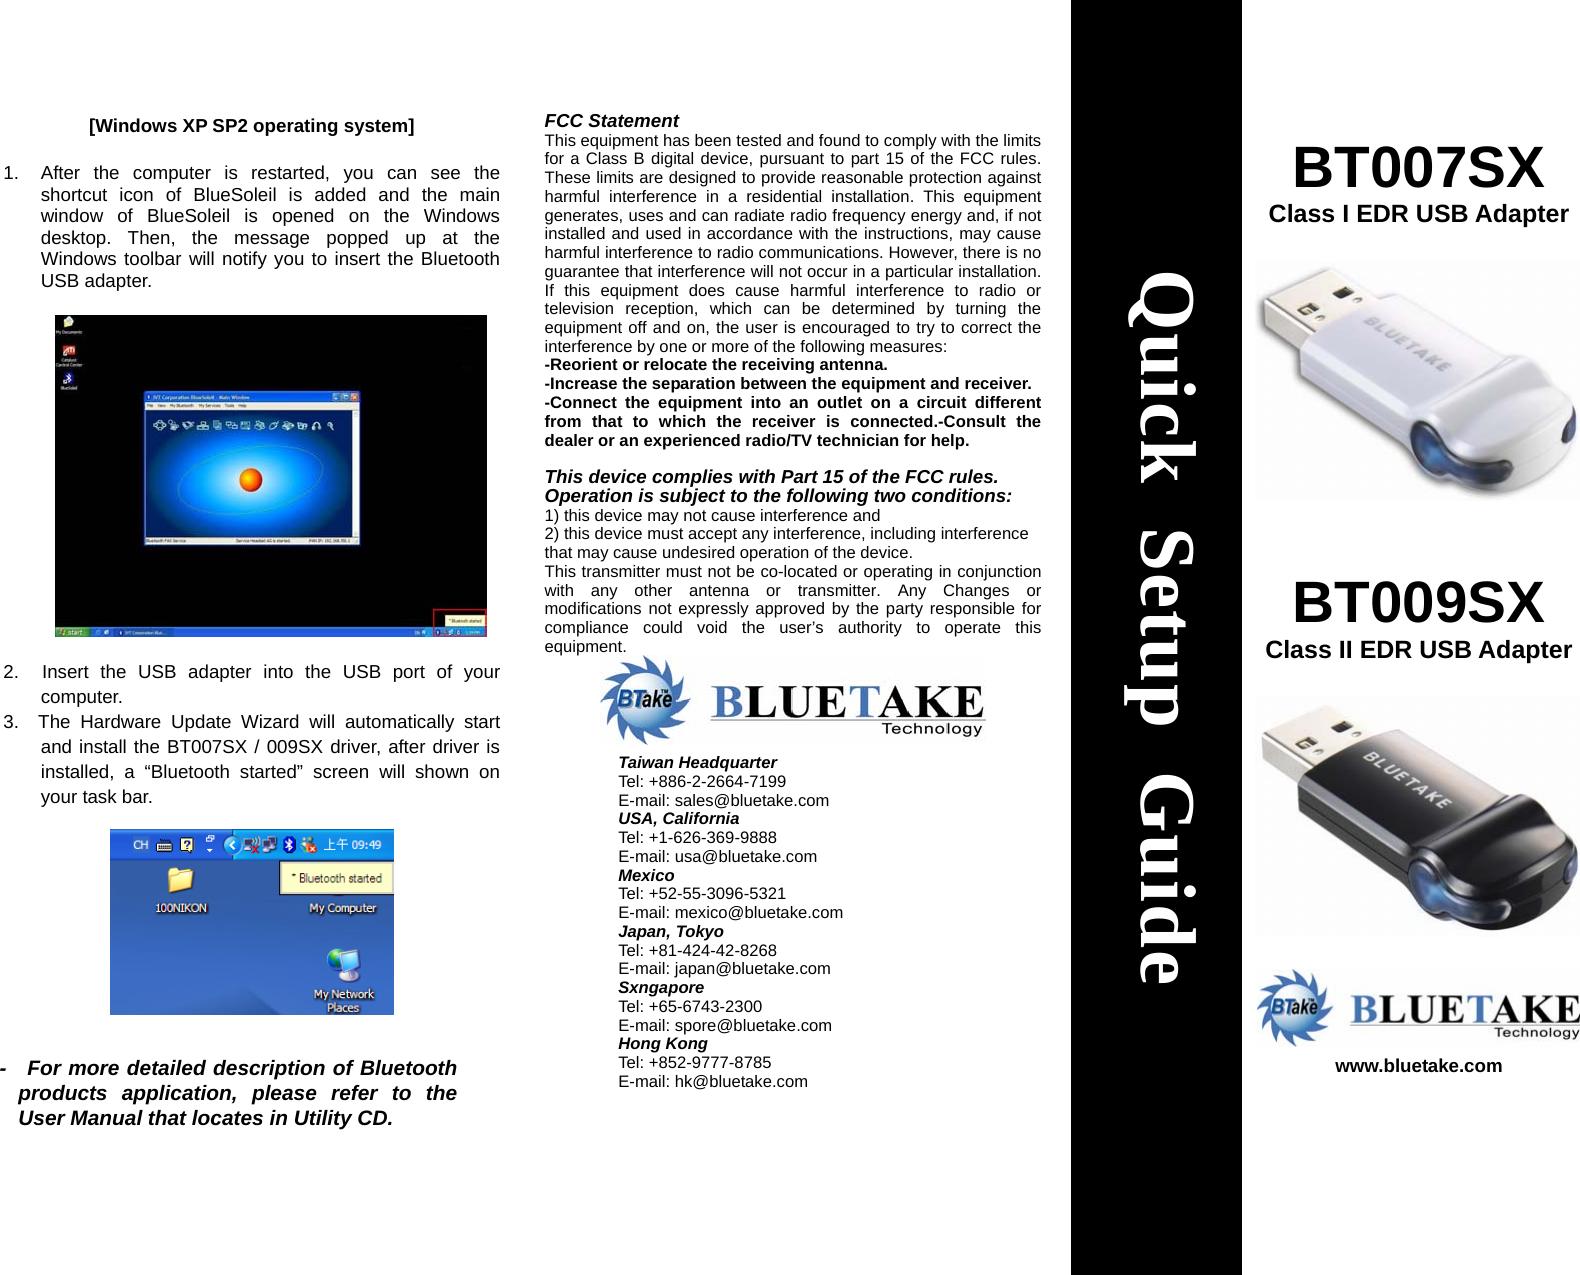 BLUETAKE BLUETOOTH ADAPTER TREIBER WINDOWS 7